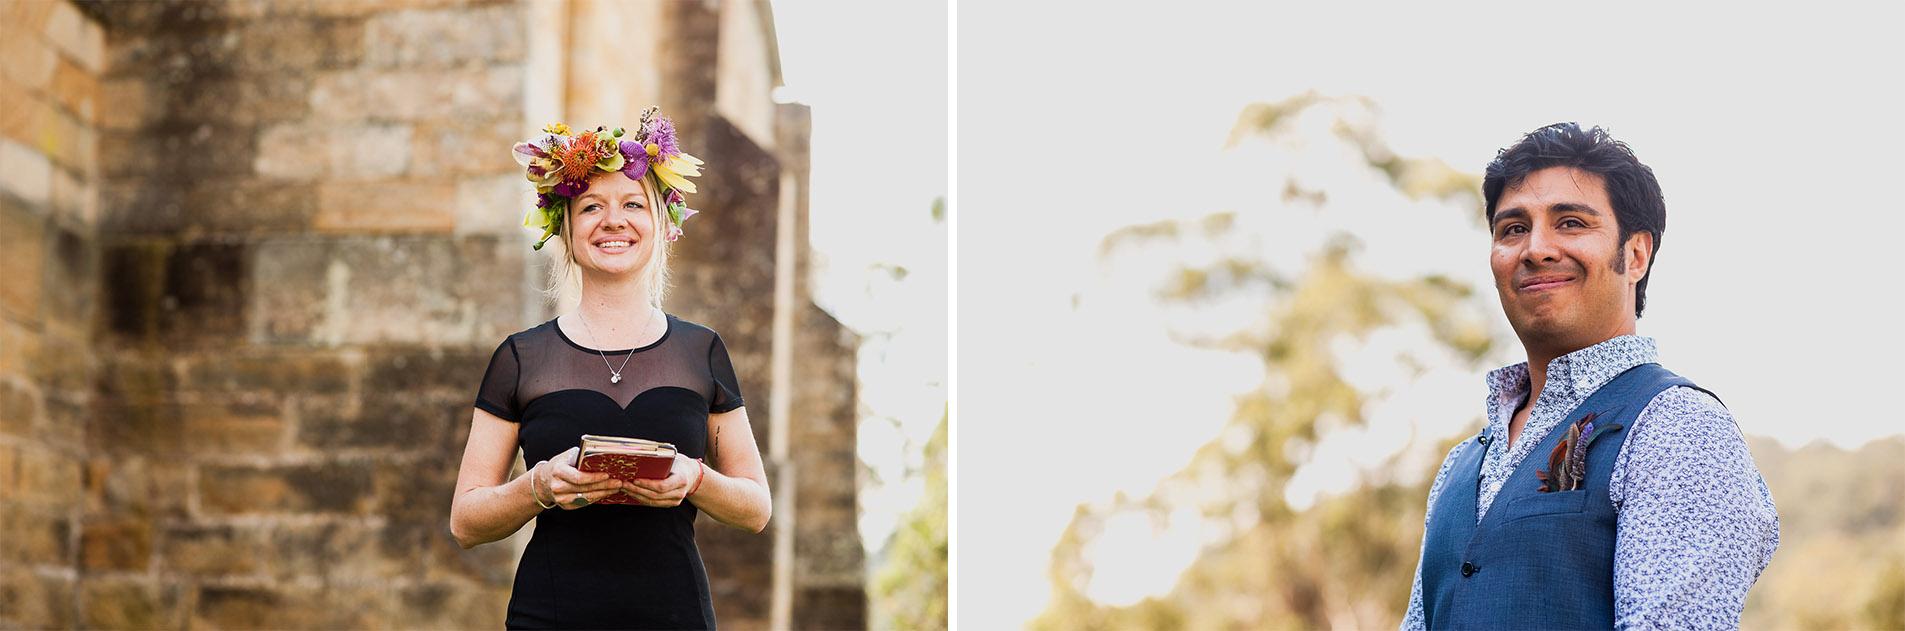 Rachel-gonzalo-wedding-sydney-24